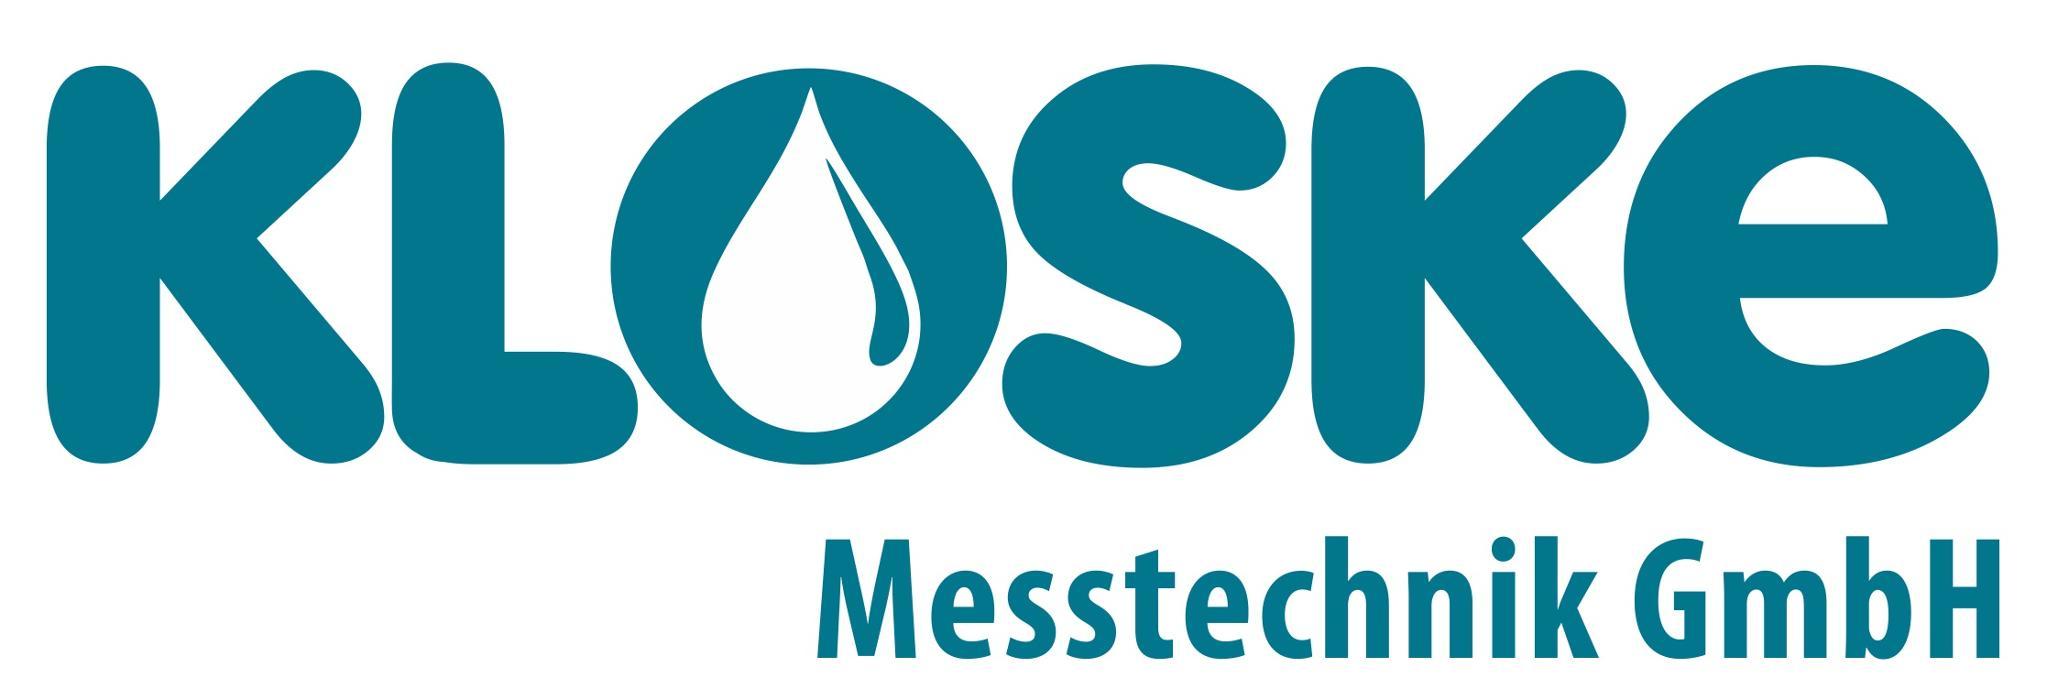 Bild zu KLOSKE Messtechnik GmbH in Bitterfeld Wolfen